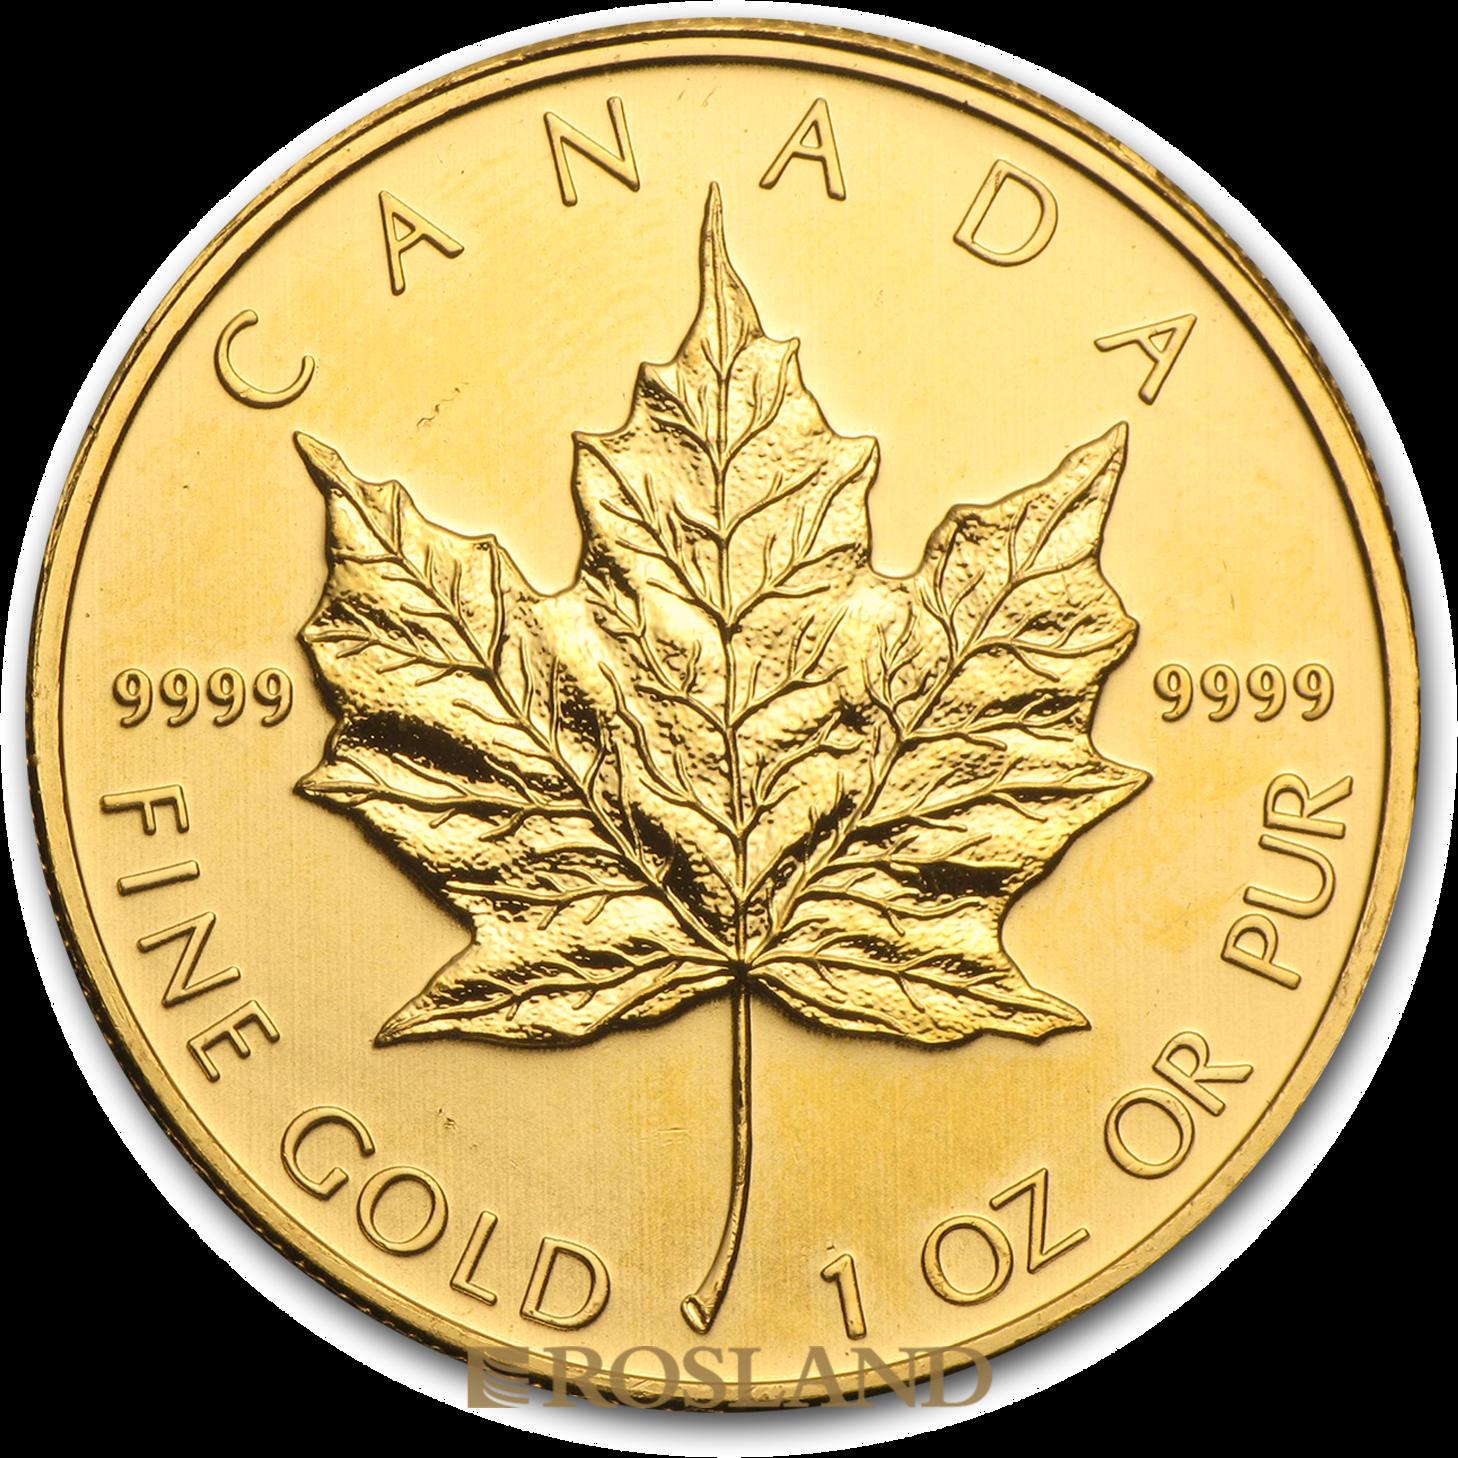 1 Unze Goldmünze Kanada Maple Leaf 2011